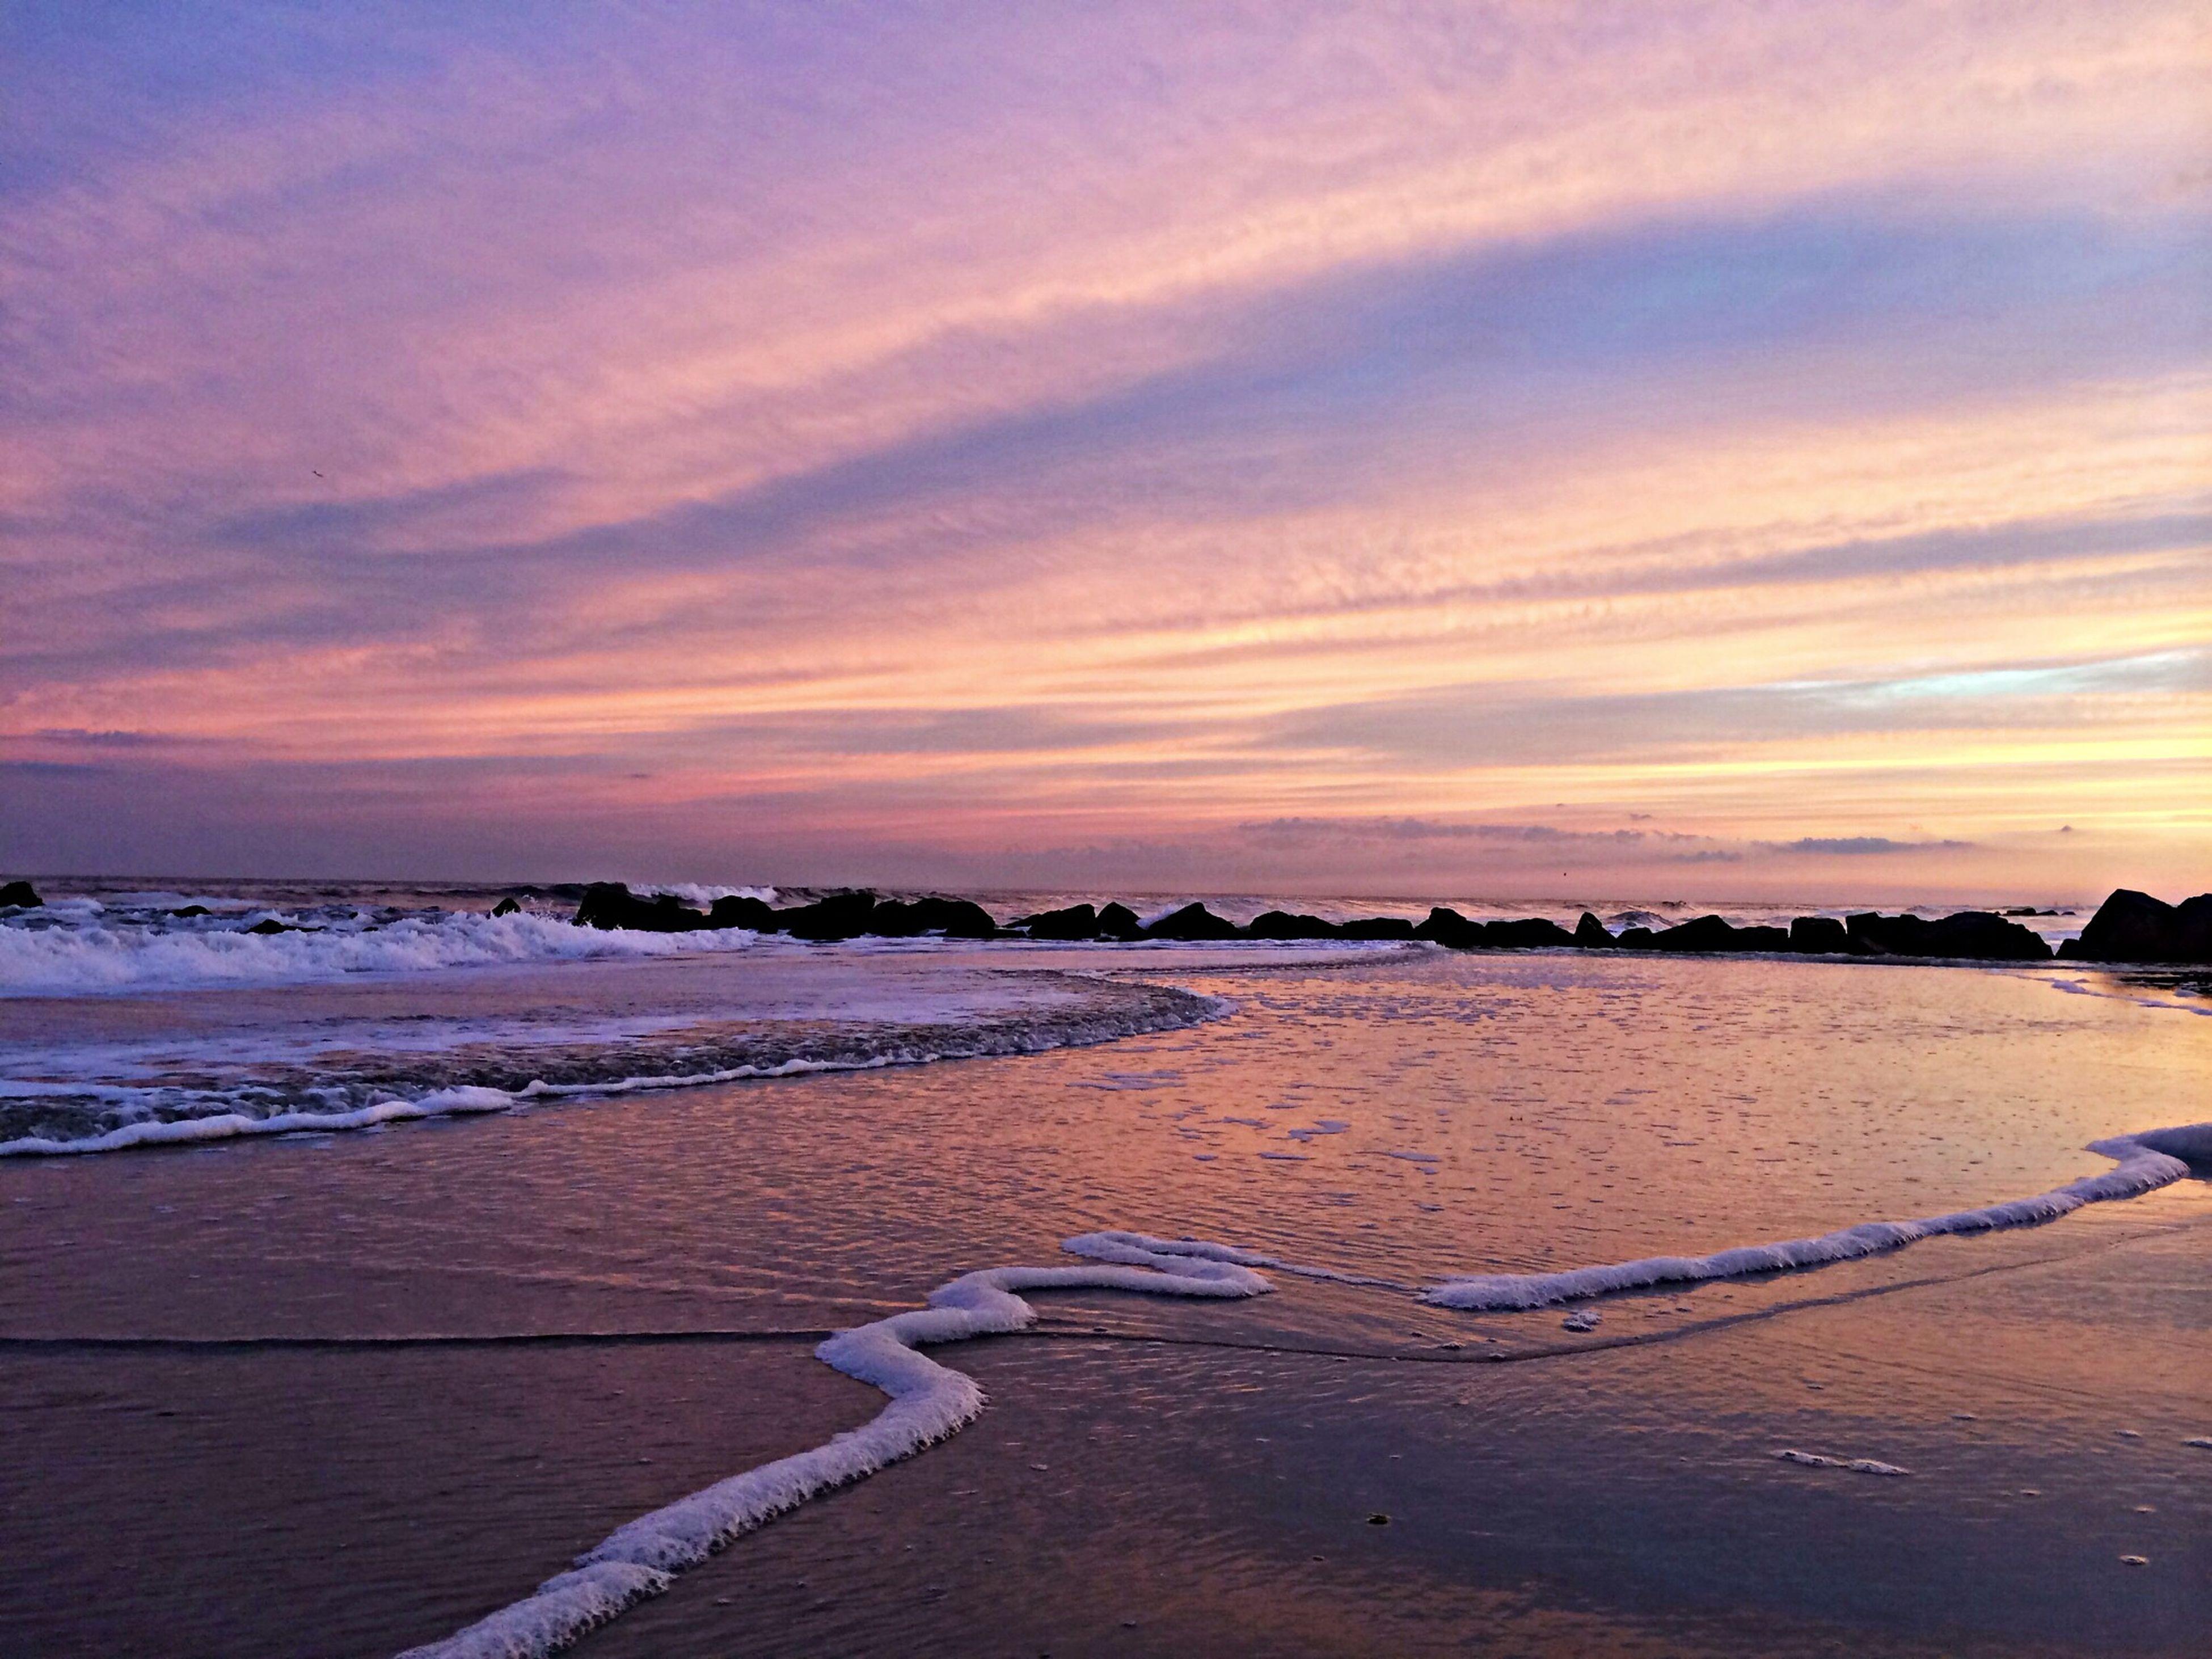 sunset, beach, sea, water, sky, scenics, tranquil scene, shore, tranquility, beauty in nature, sand, orange color, cloud - sky, nature, idyllic, horizon over water, outdoors, cloud, coastline, non-urban scene